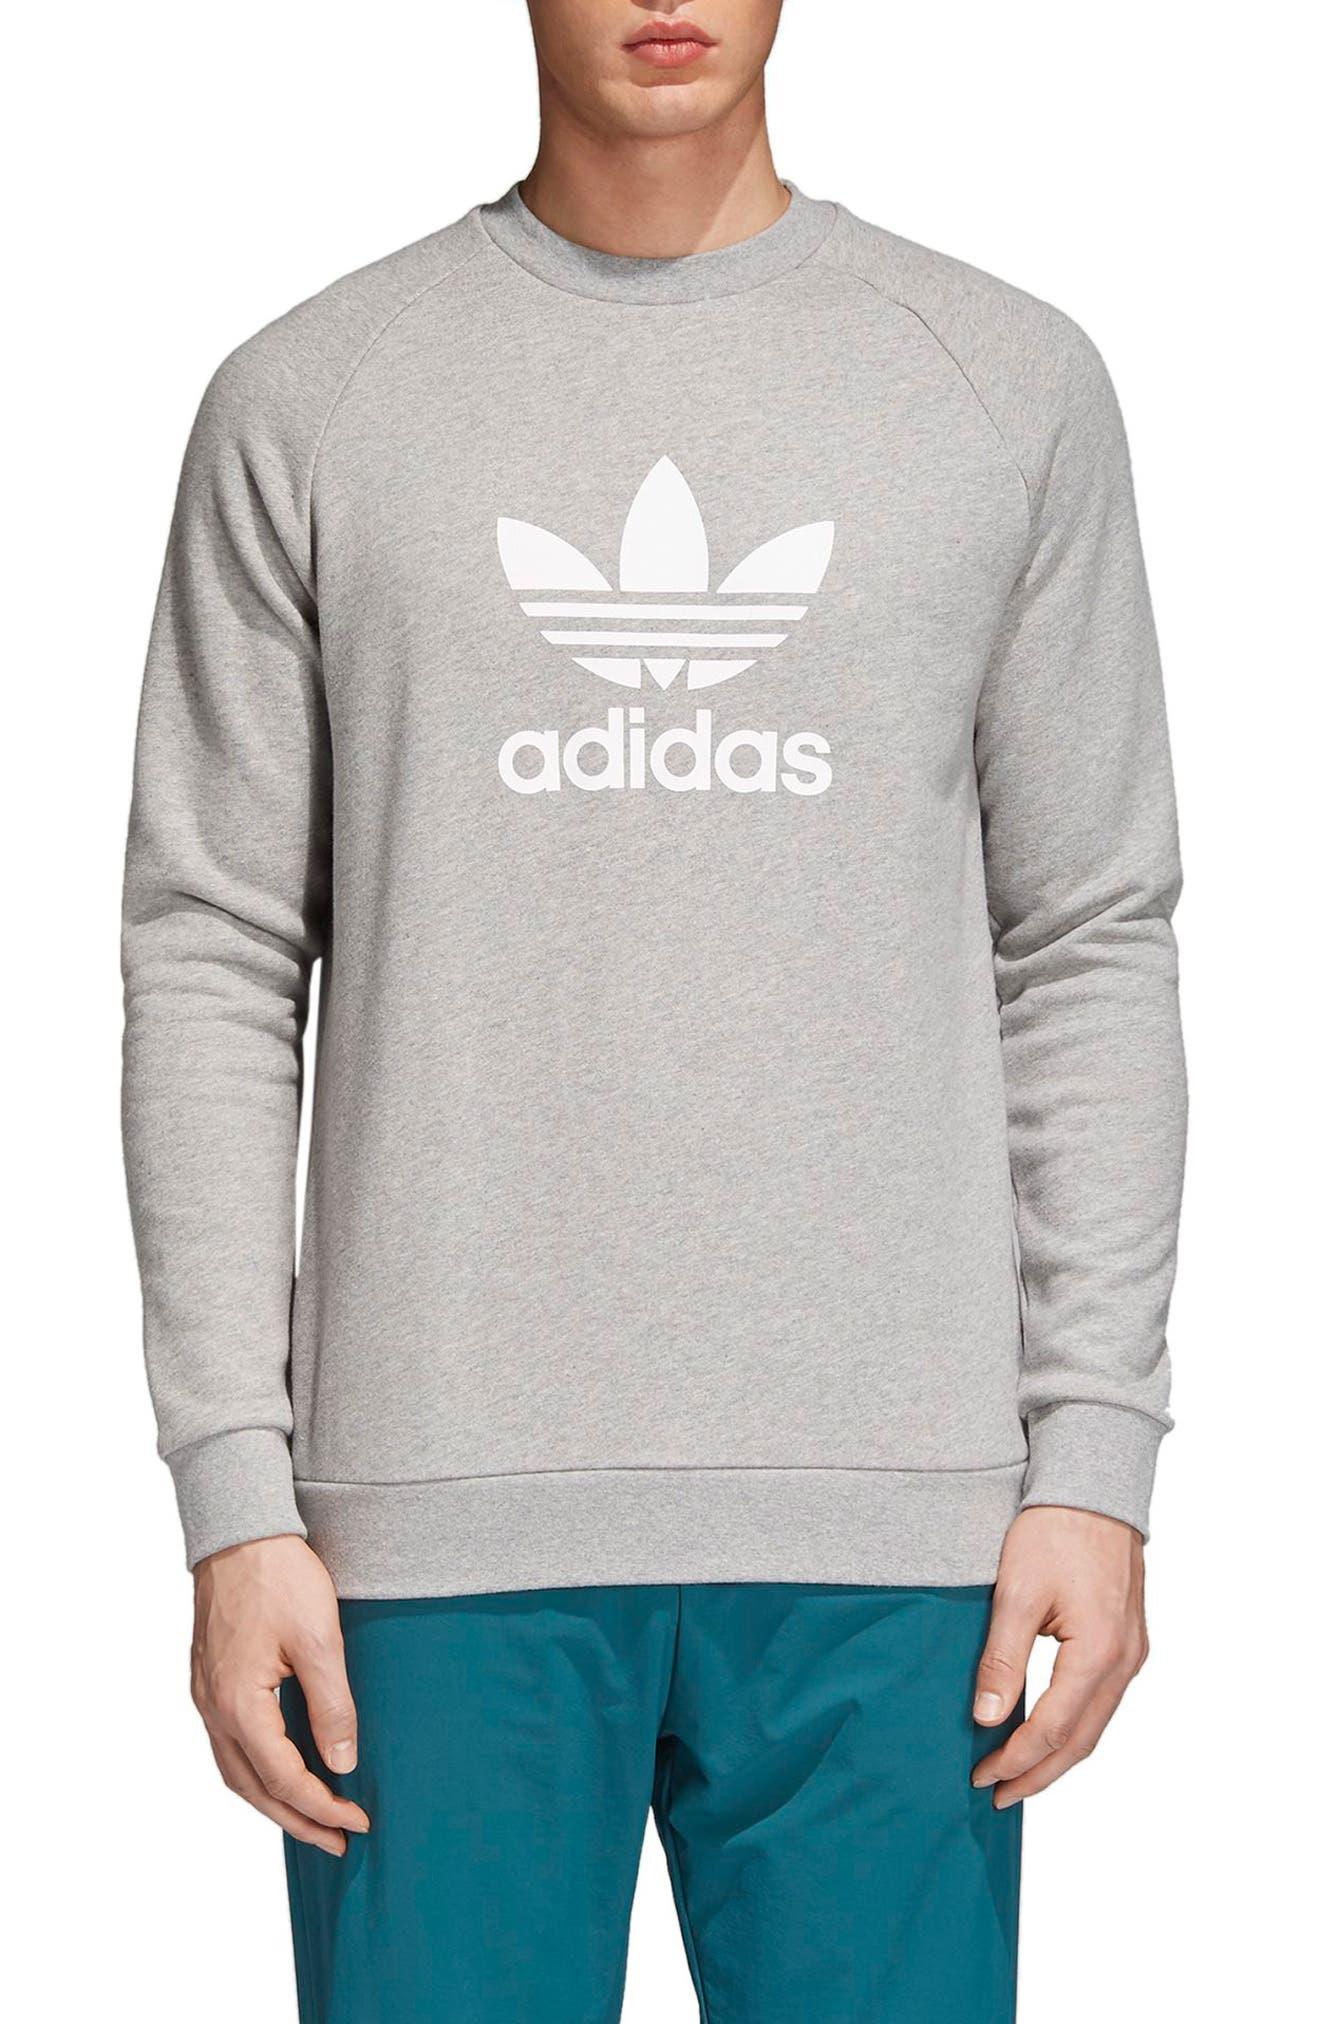 adidas Trefoil Crewneck Sweatshirt,                         Main,                         color,